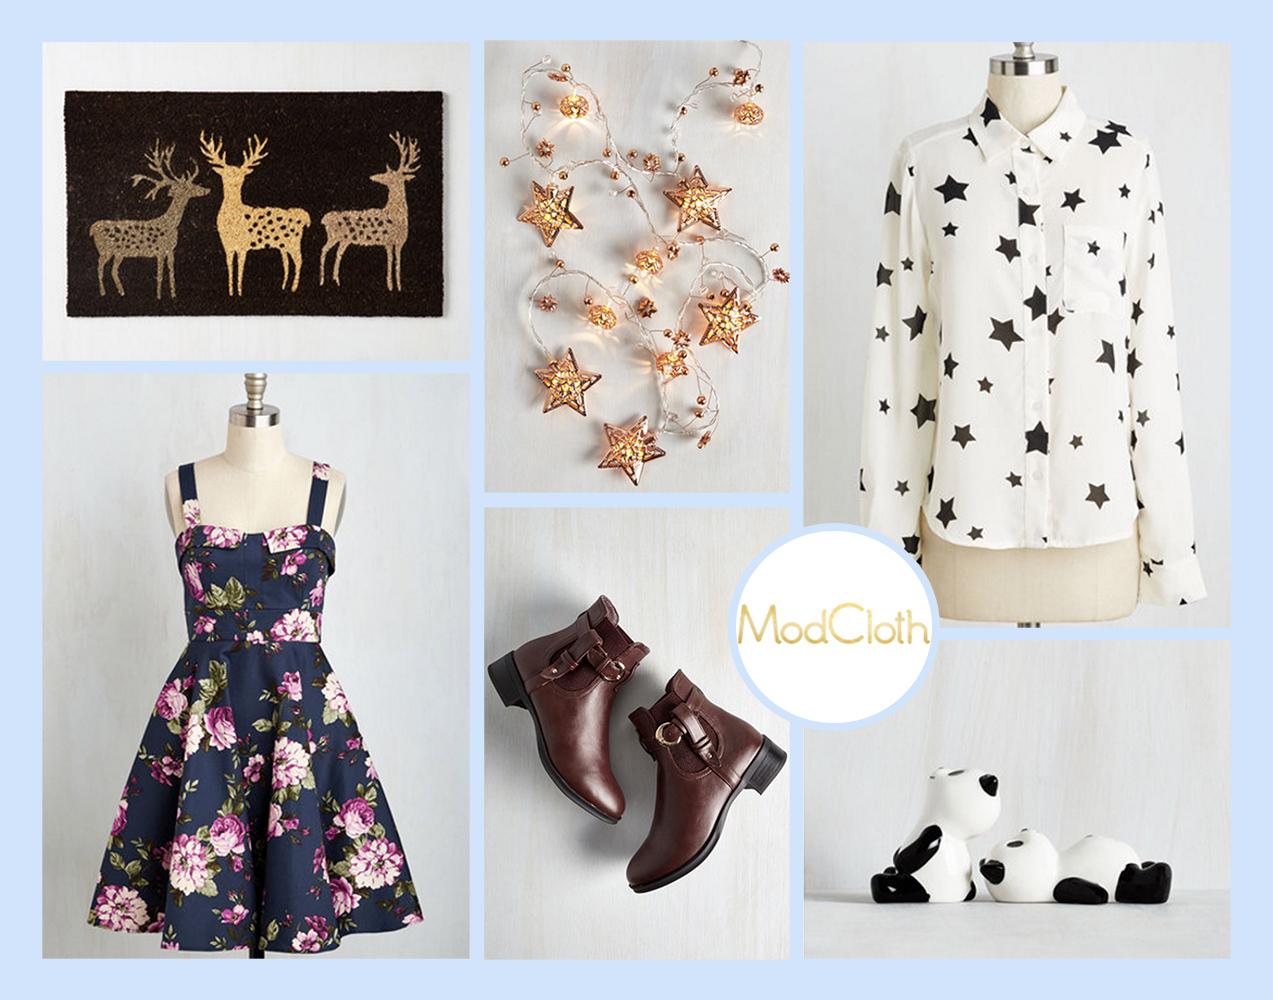 Modcloth Black Friday Sale